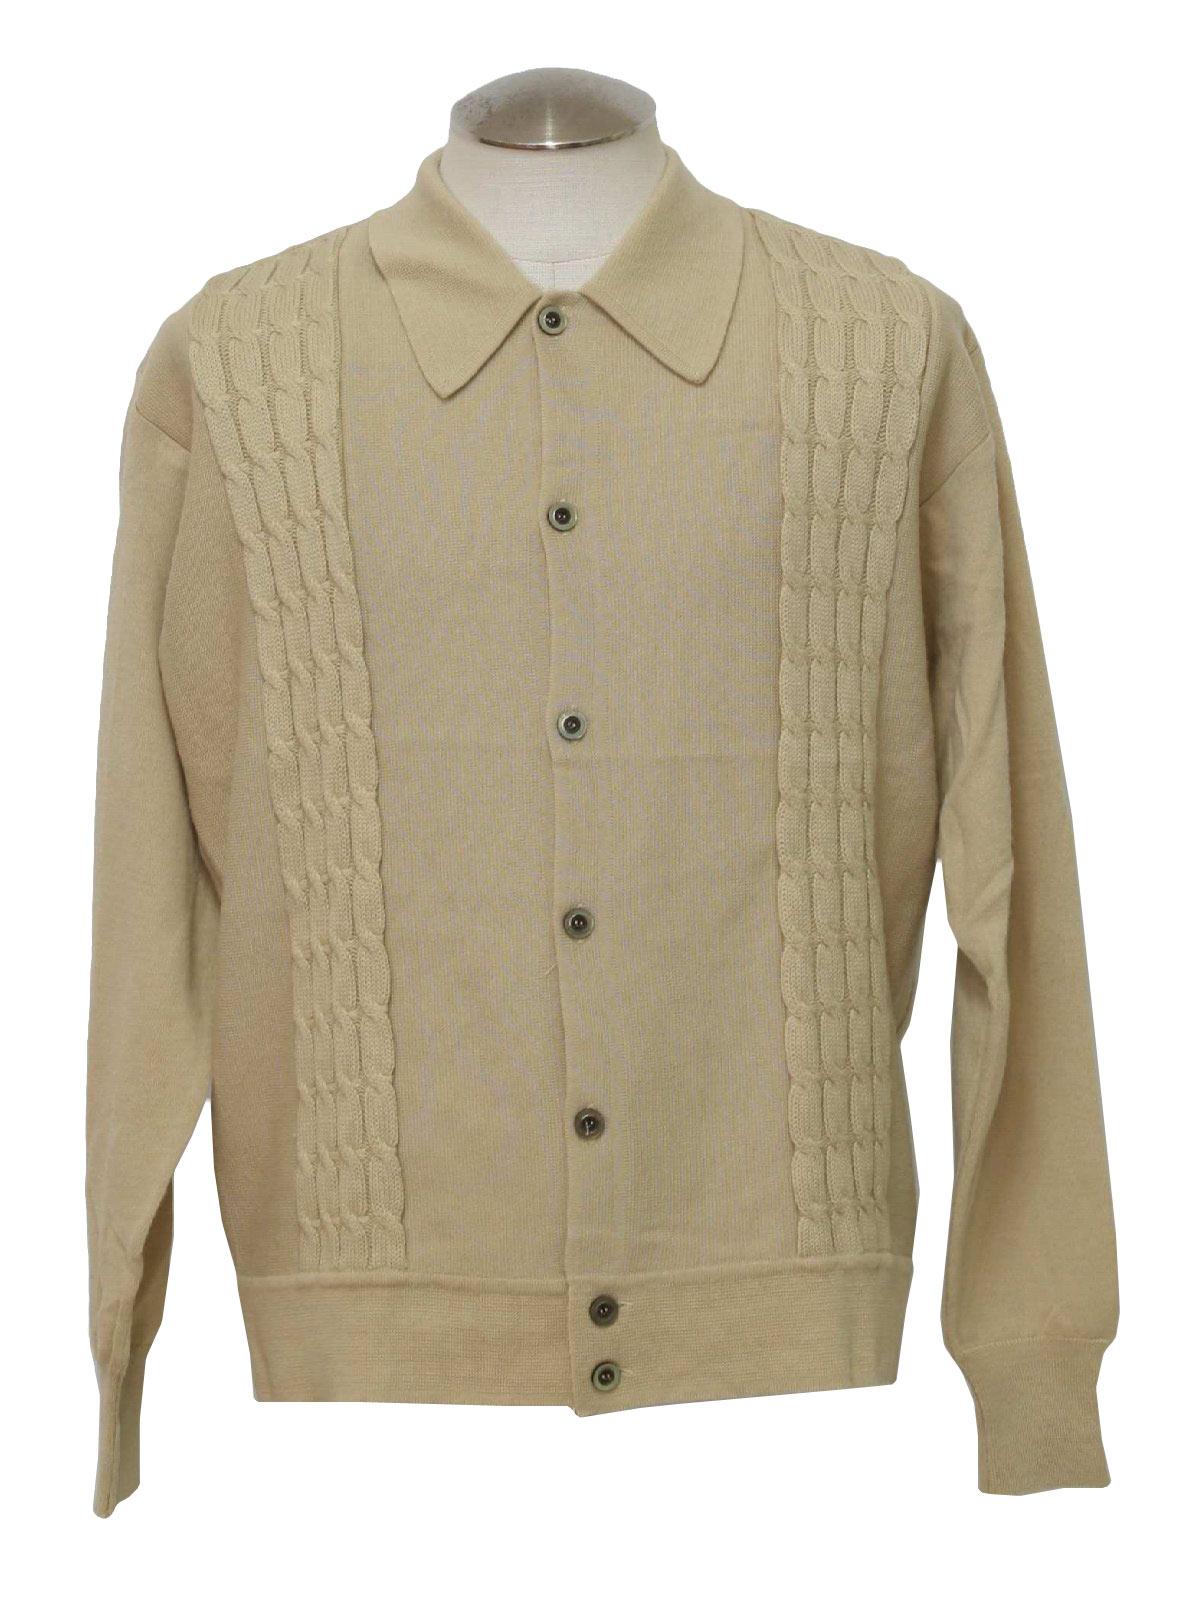 Racquet Club 70's Vintage Caridgan Sweater: 70s -Racquet Club ...